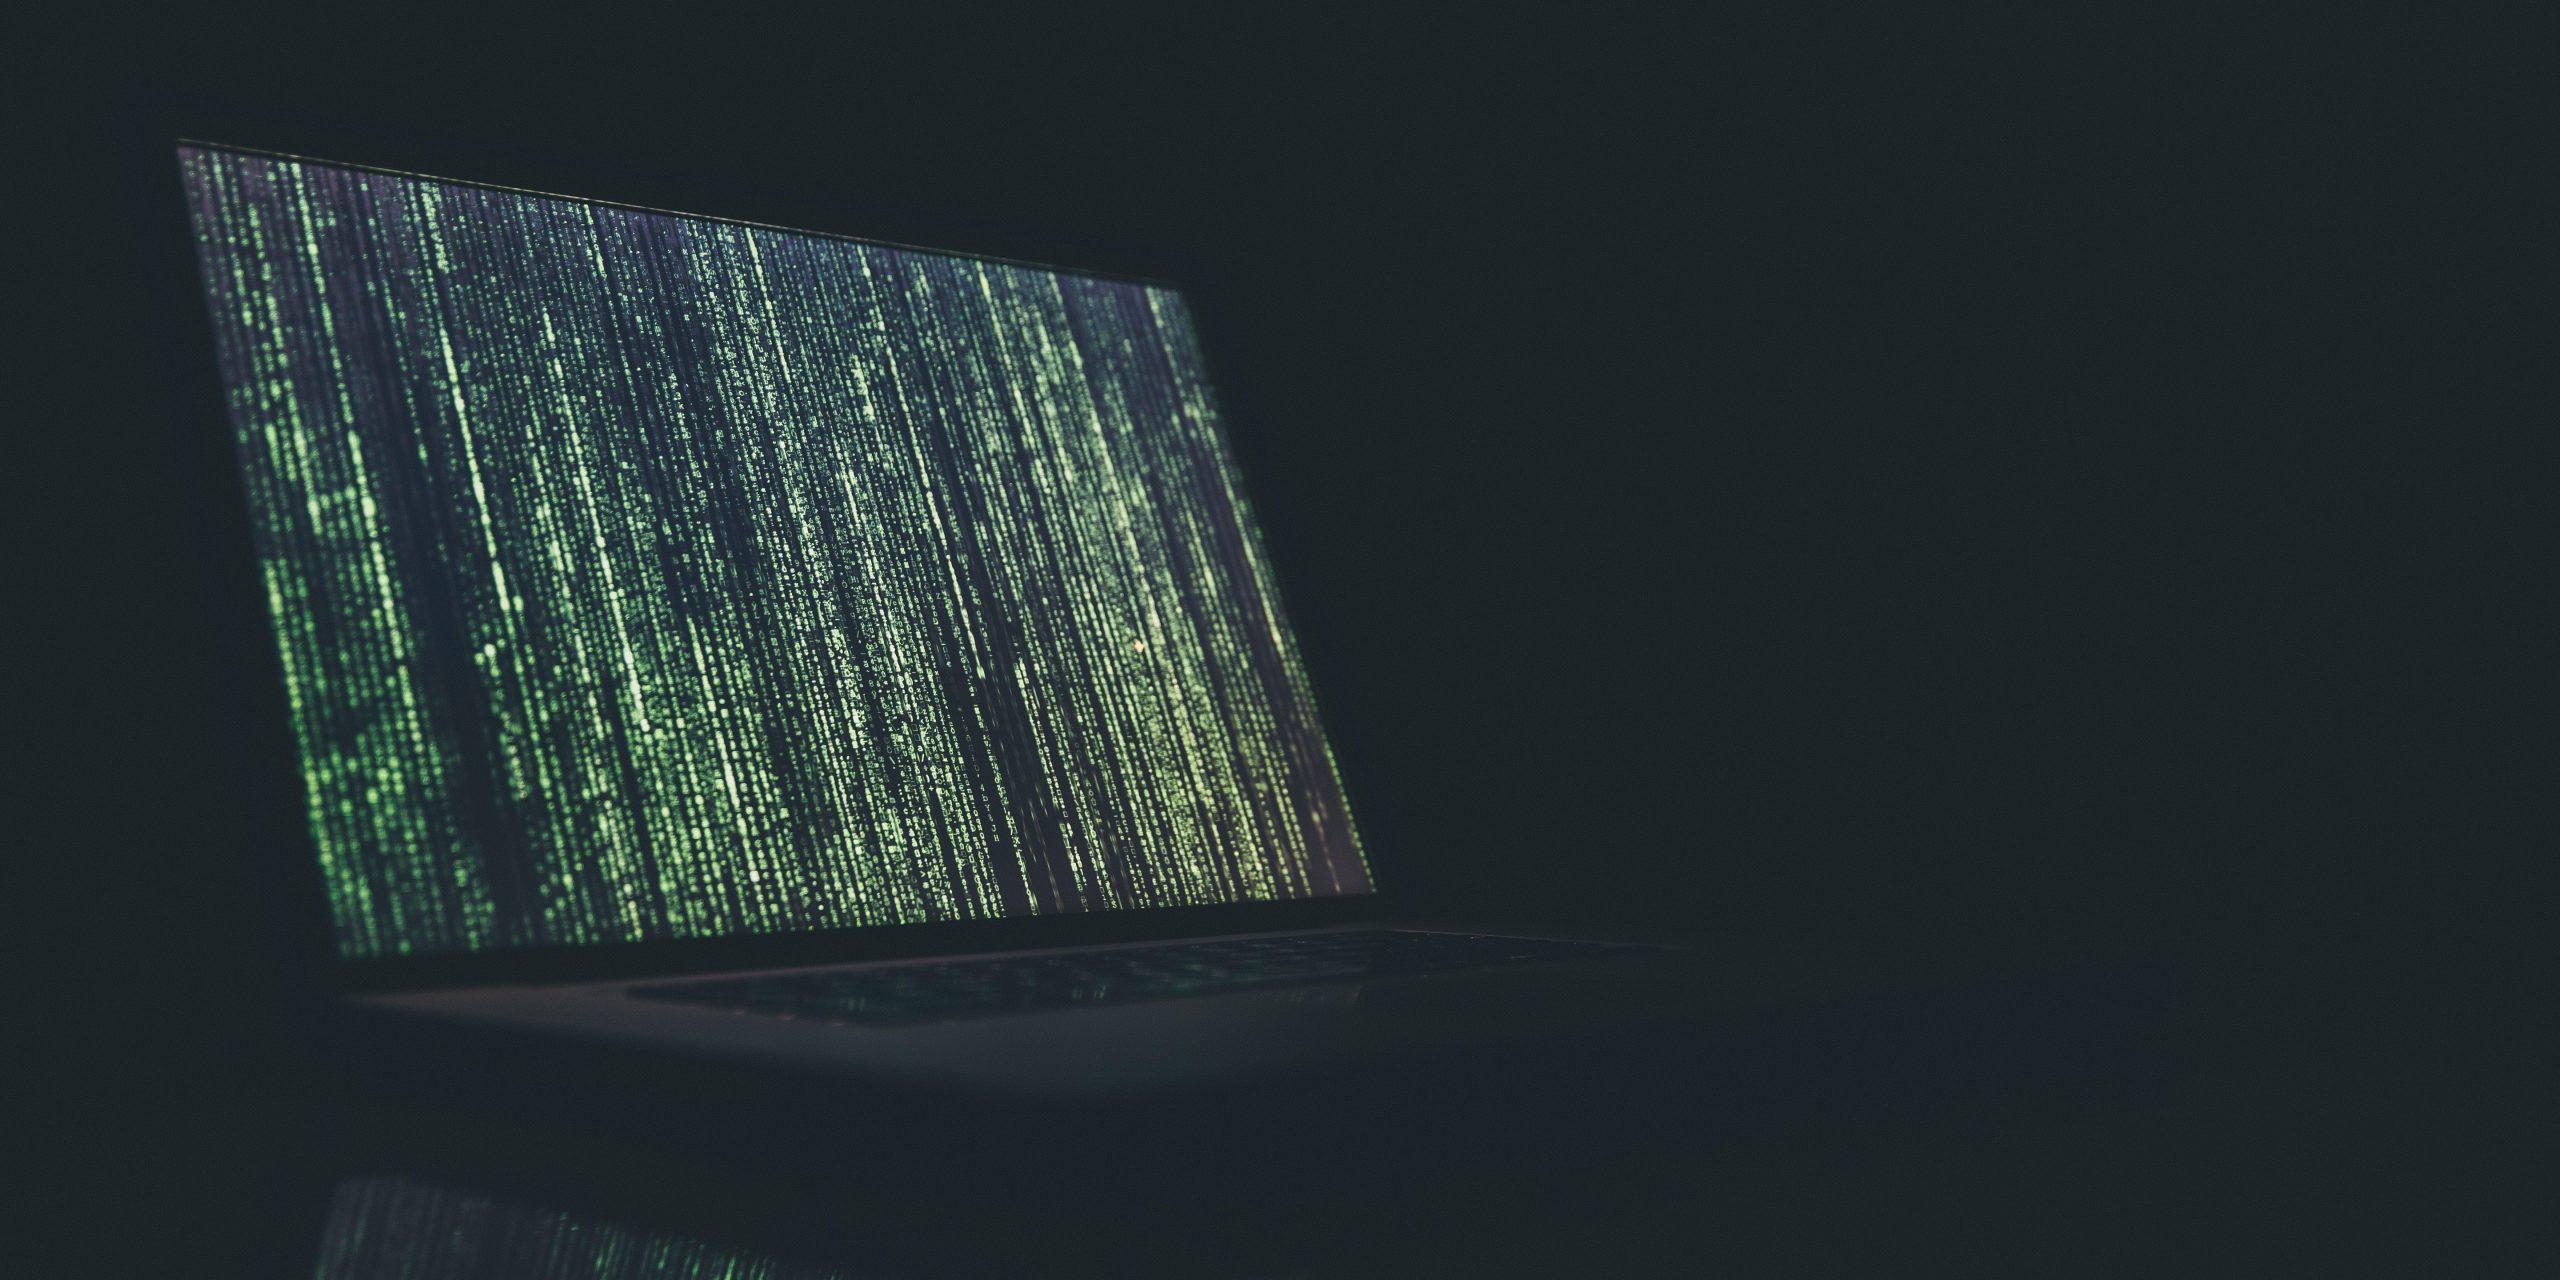 «Росэлектроника» представила цифровую систему для Севморпути